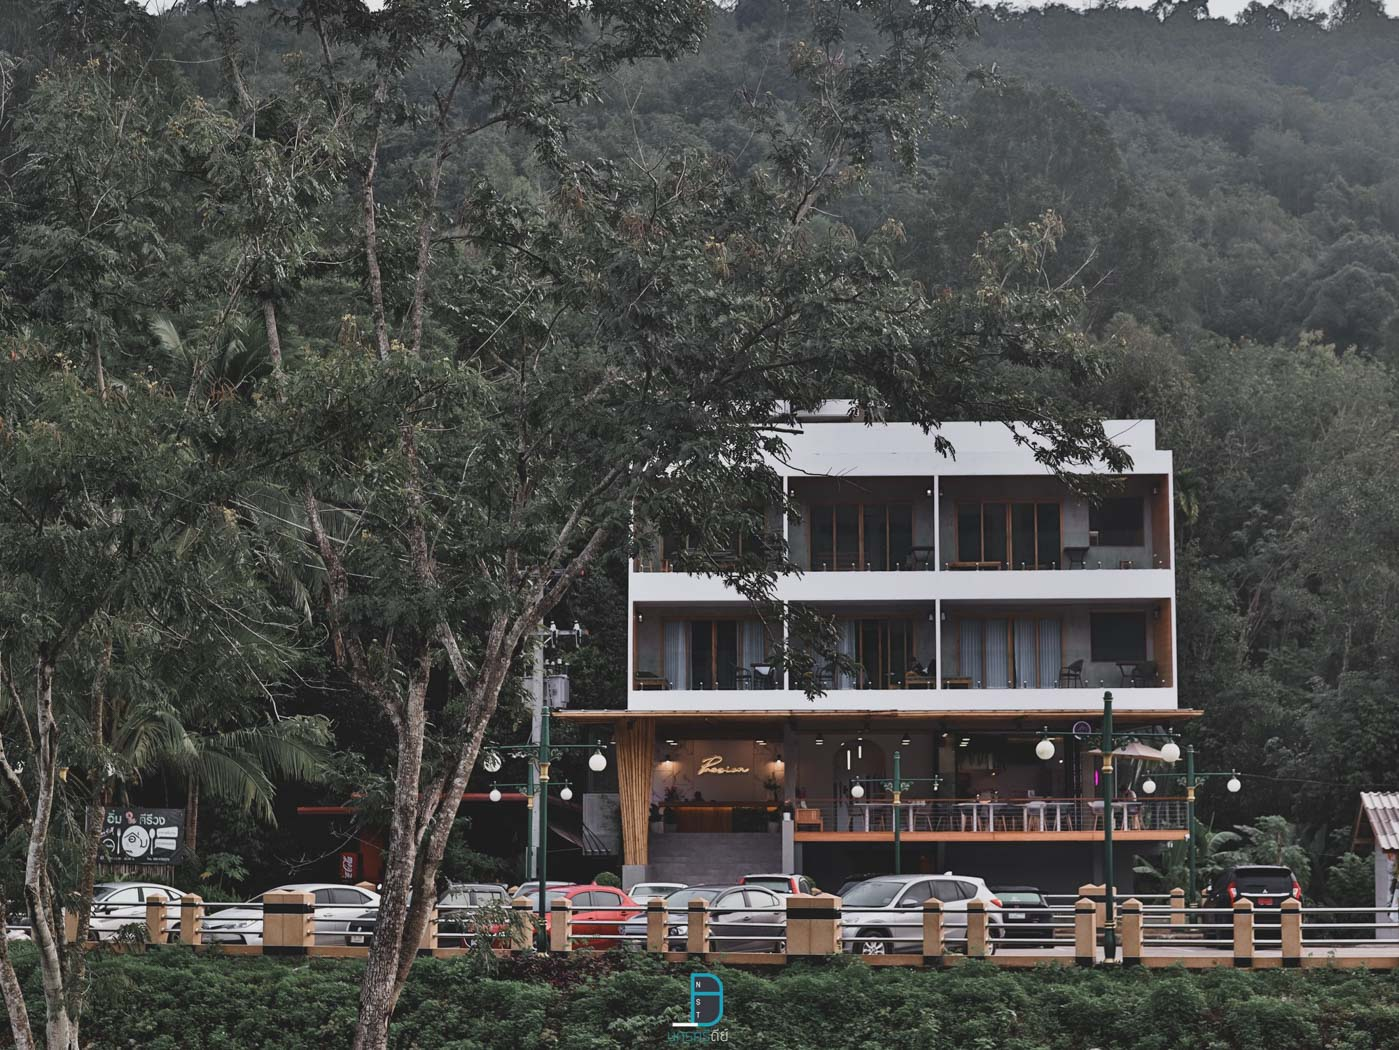 3.-Passion-Resort-คีรีวง คลิกที่นี่ ที่พัก,นครศรีธรรมราช,เที่ยว,เมืองคอน,วิวหลักล้าน,สวย